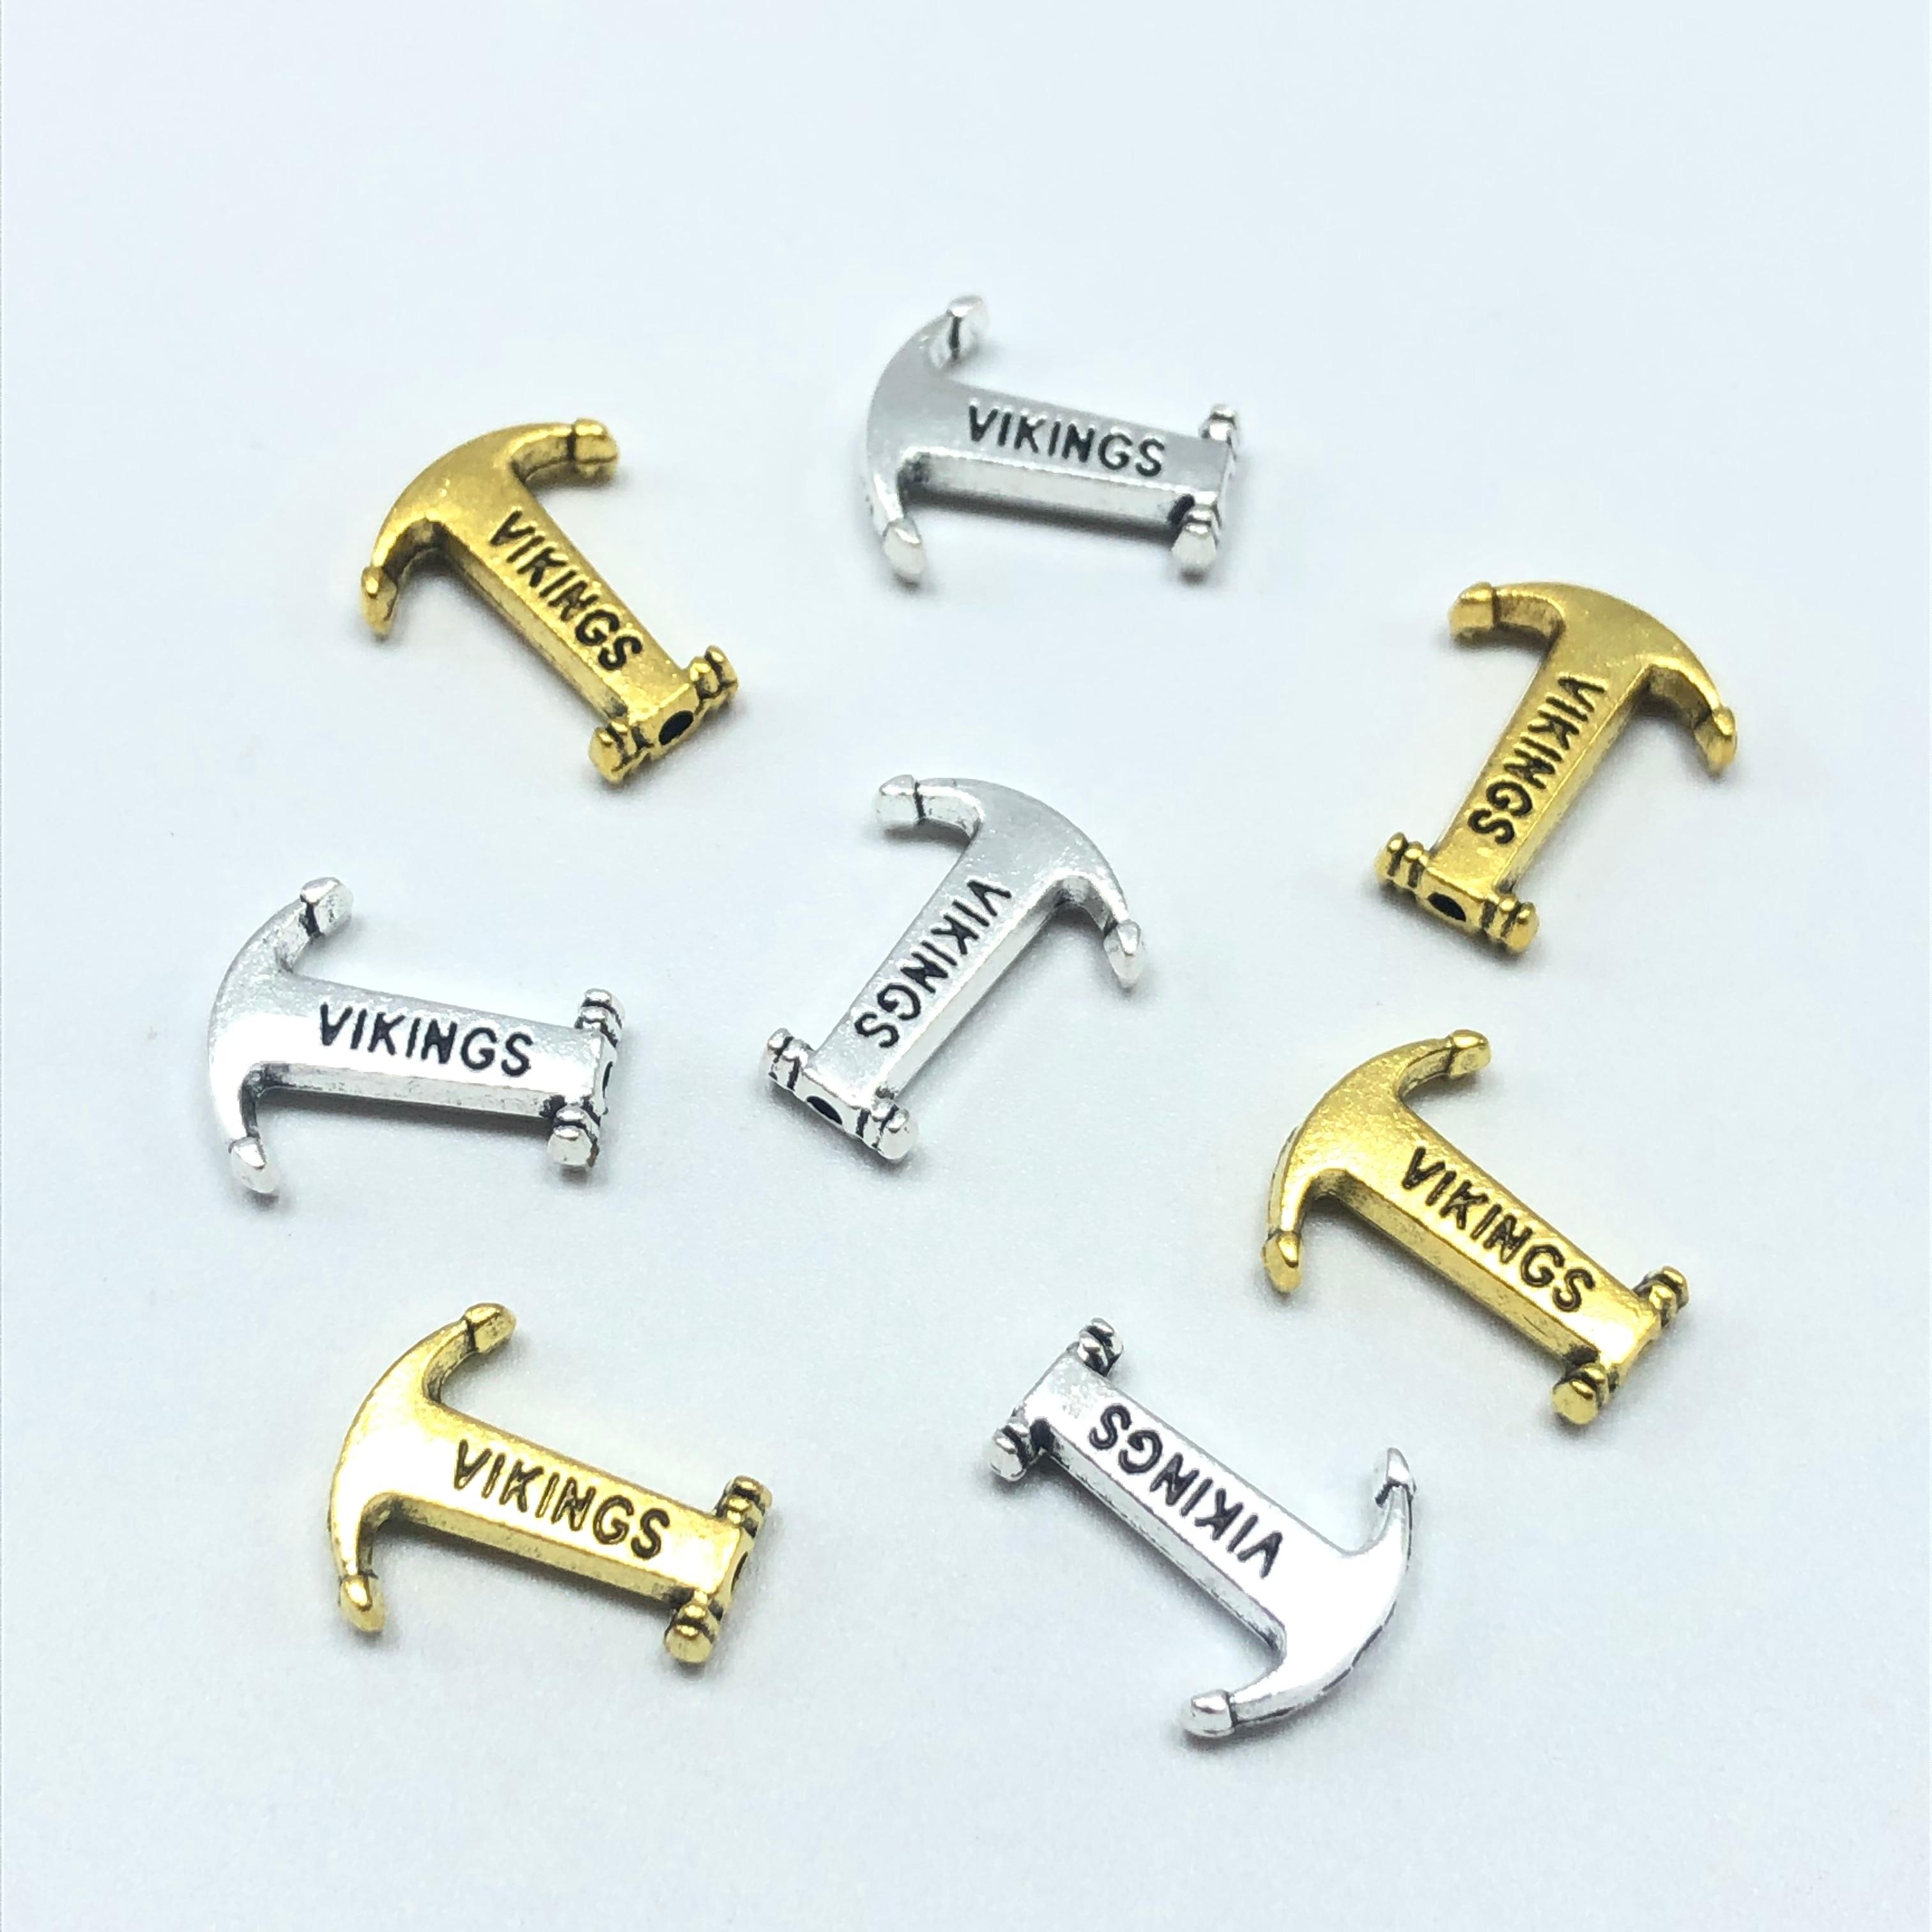 Making Xmas Diy Stainless Steel Silver Charm Pendants Beads DIY Jewelry Findings